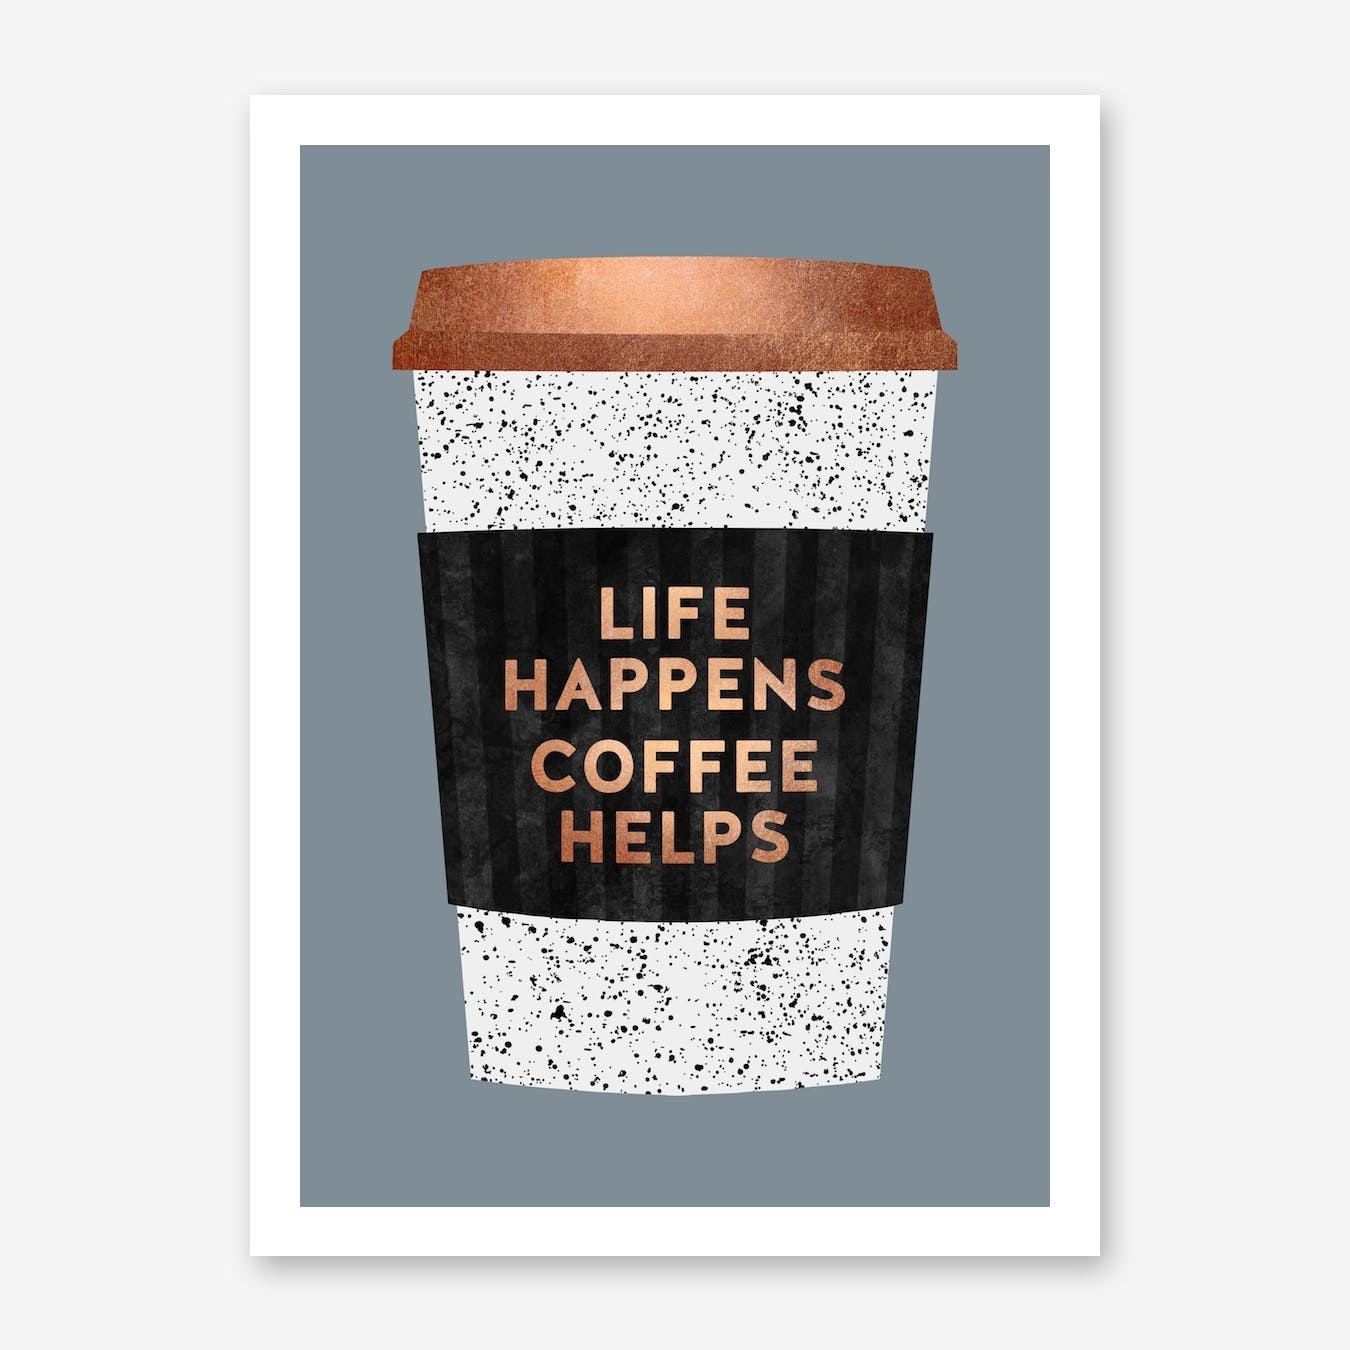 Life Happens Coffee Helps 2